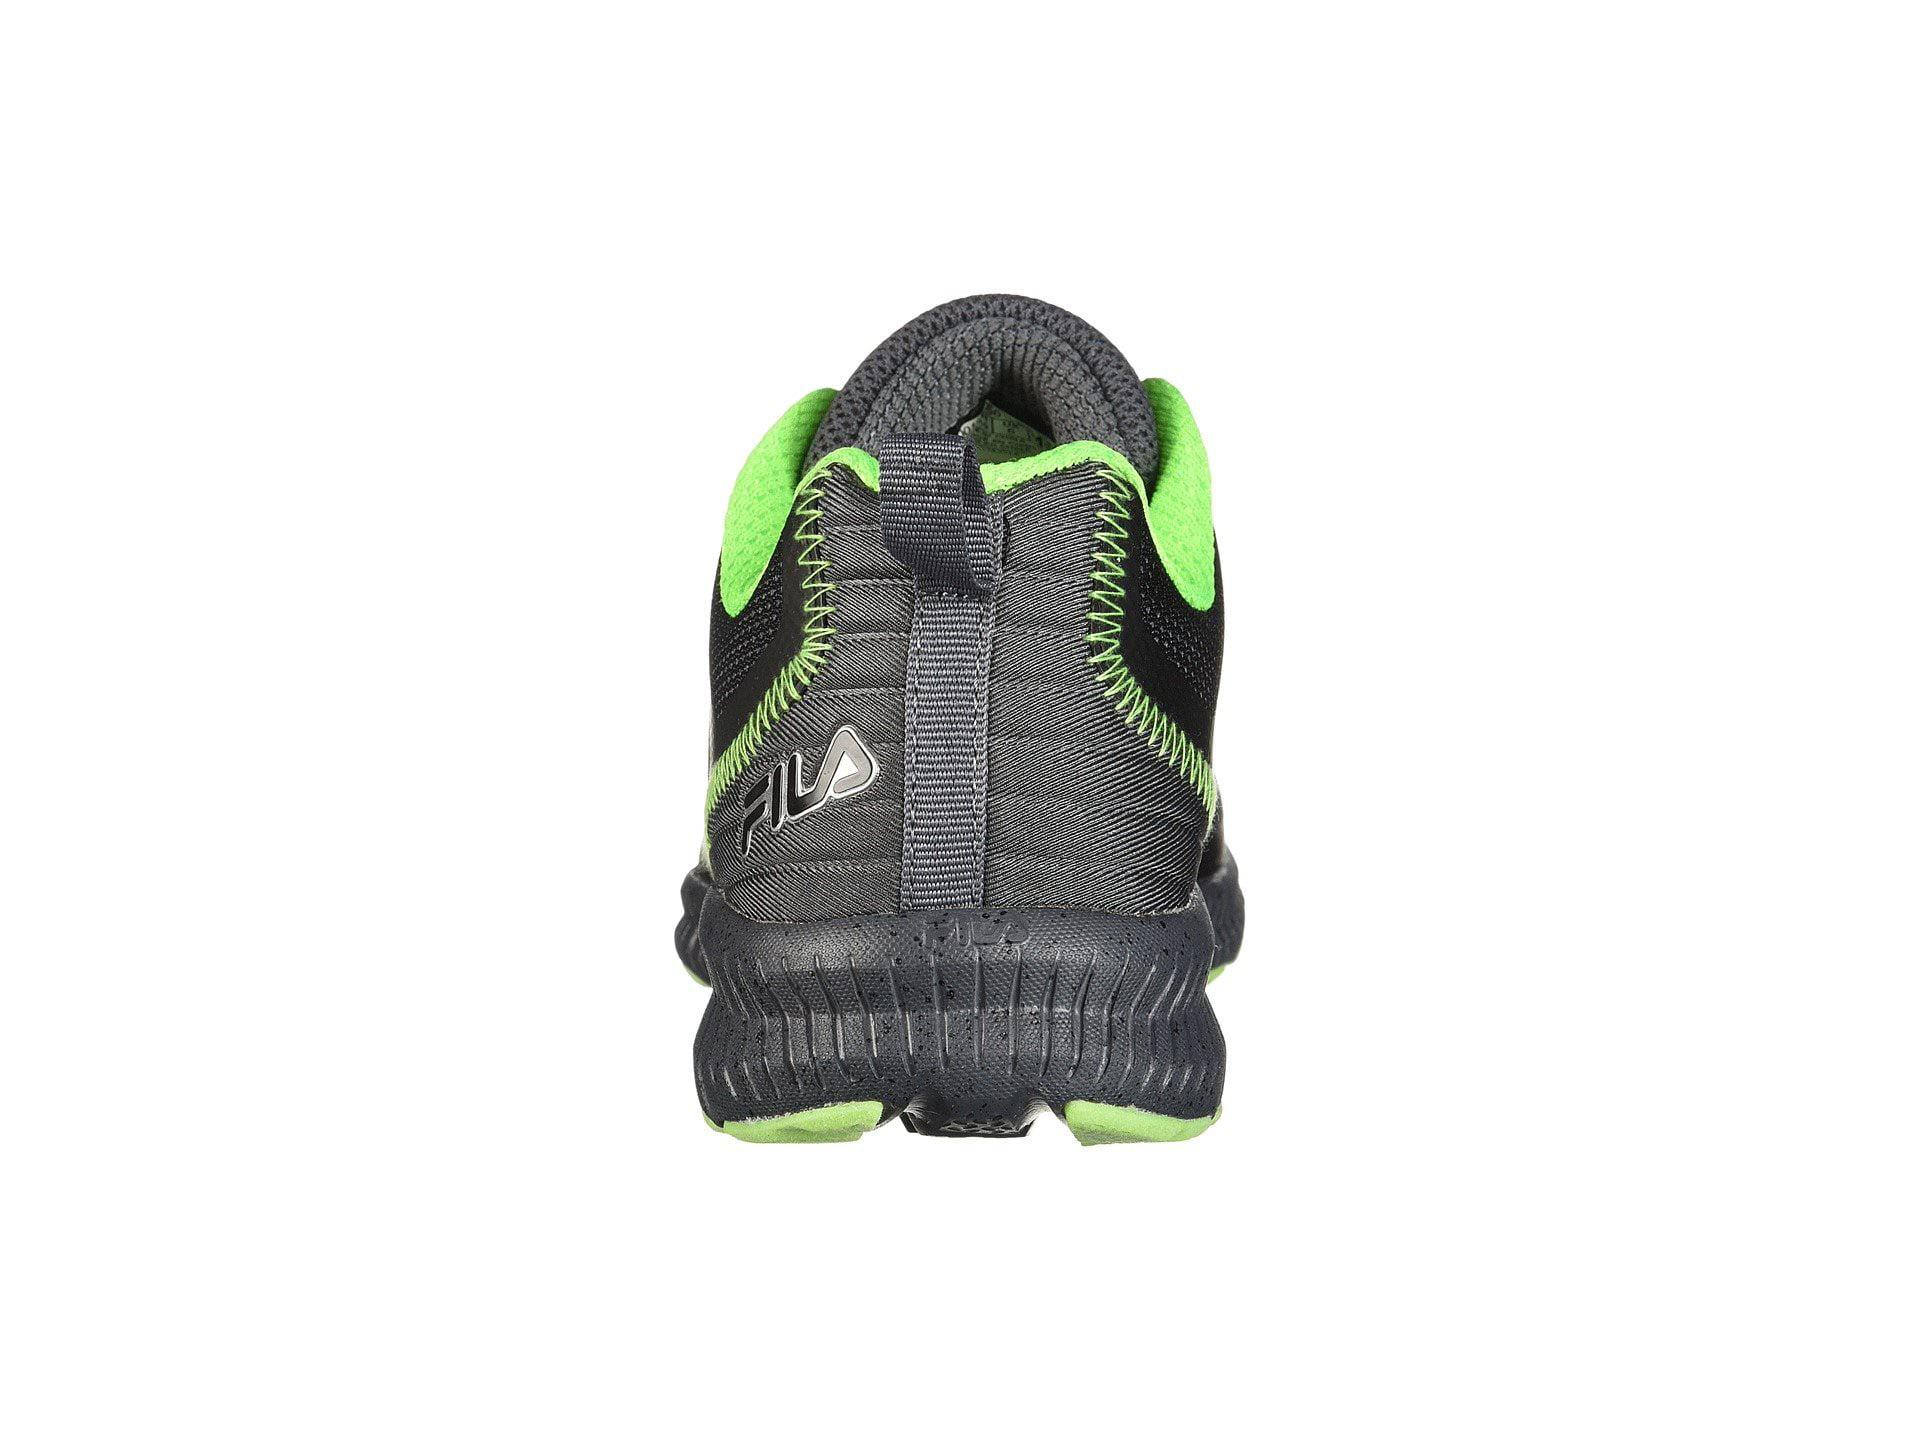 510d585b8894 Fila - Fila Memory Speedstride Trail Mens Low Top Athletic Running Shoes  (Dark Silver -Black -Green Gecko